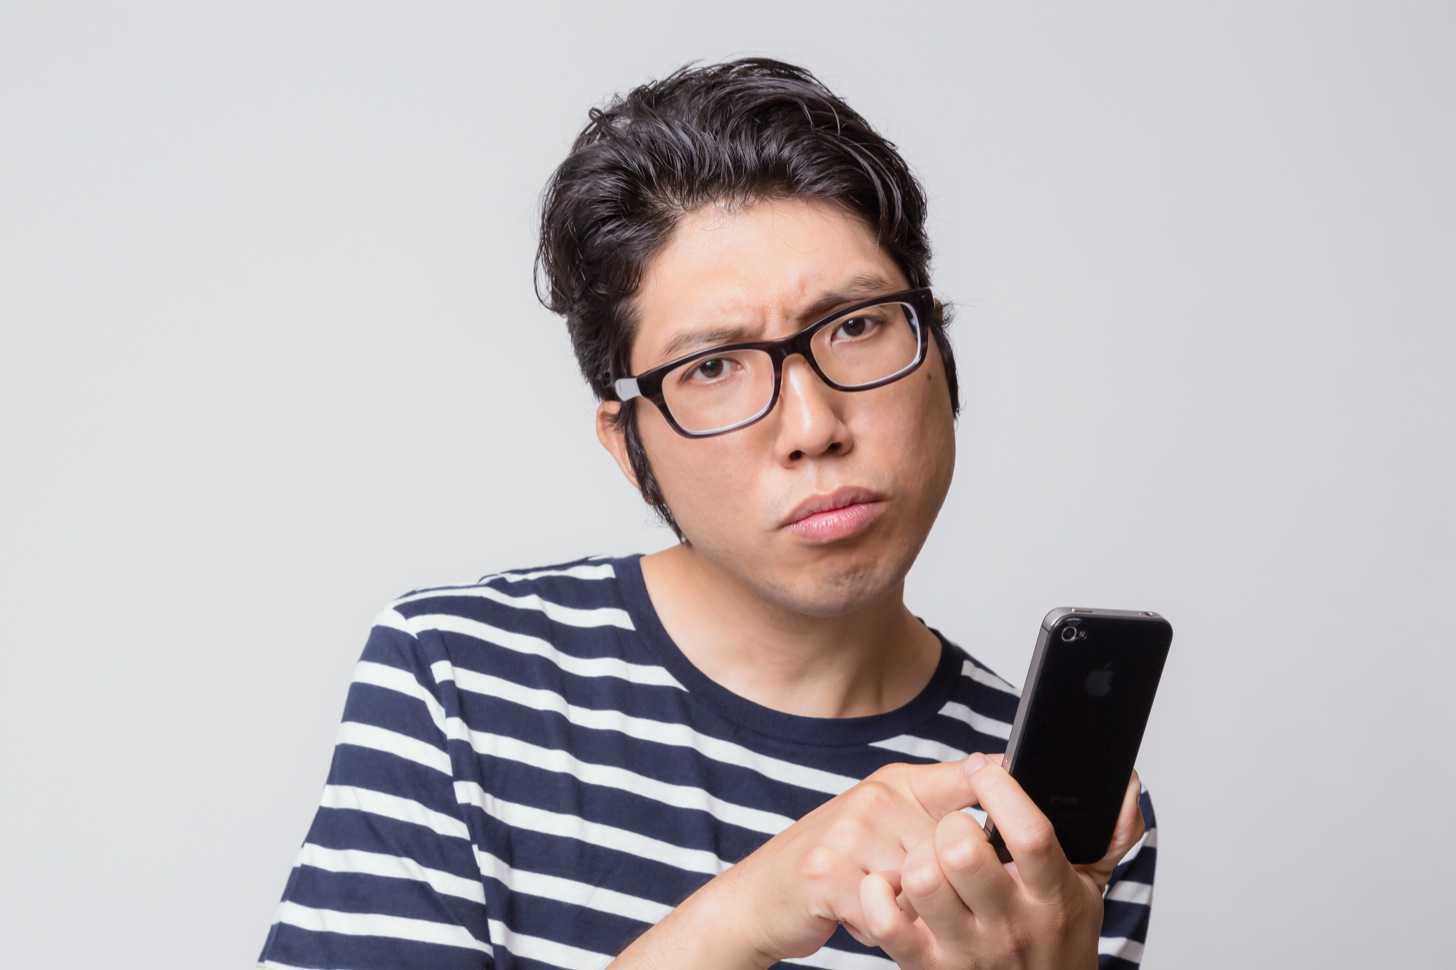 iPhoneでSiriやFacetimeが使えなくて困っている男